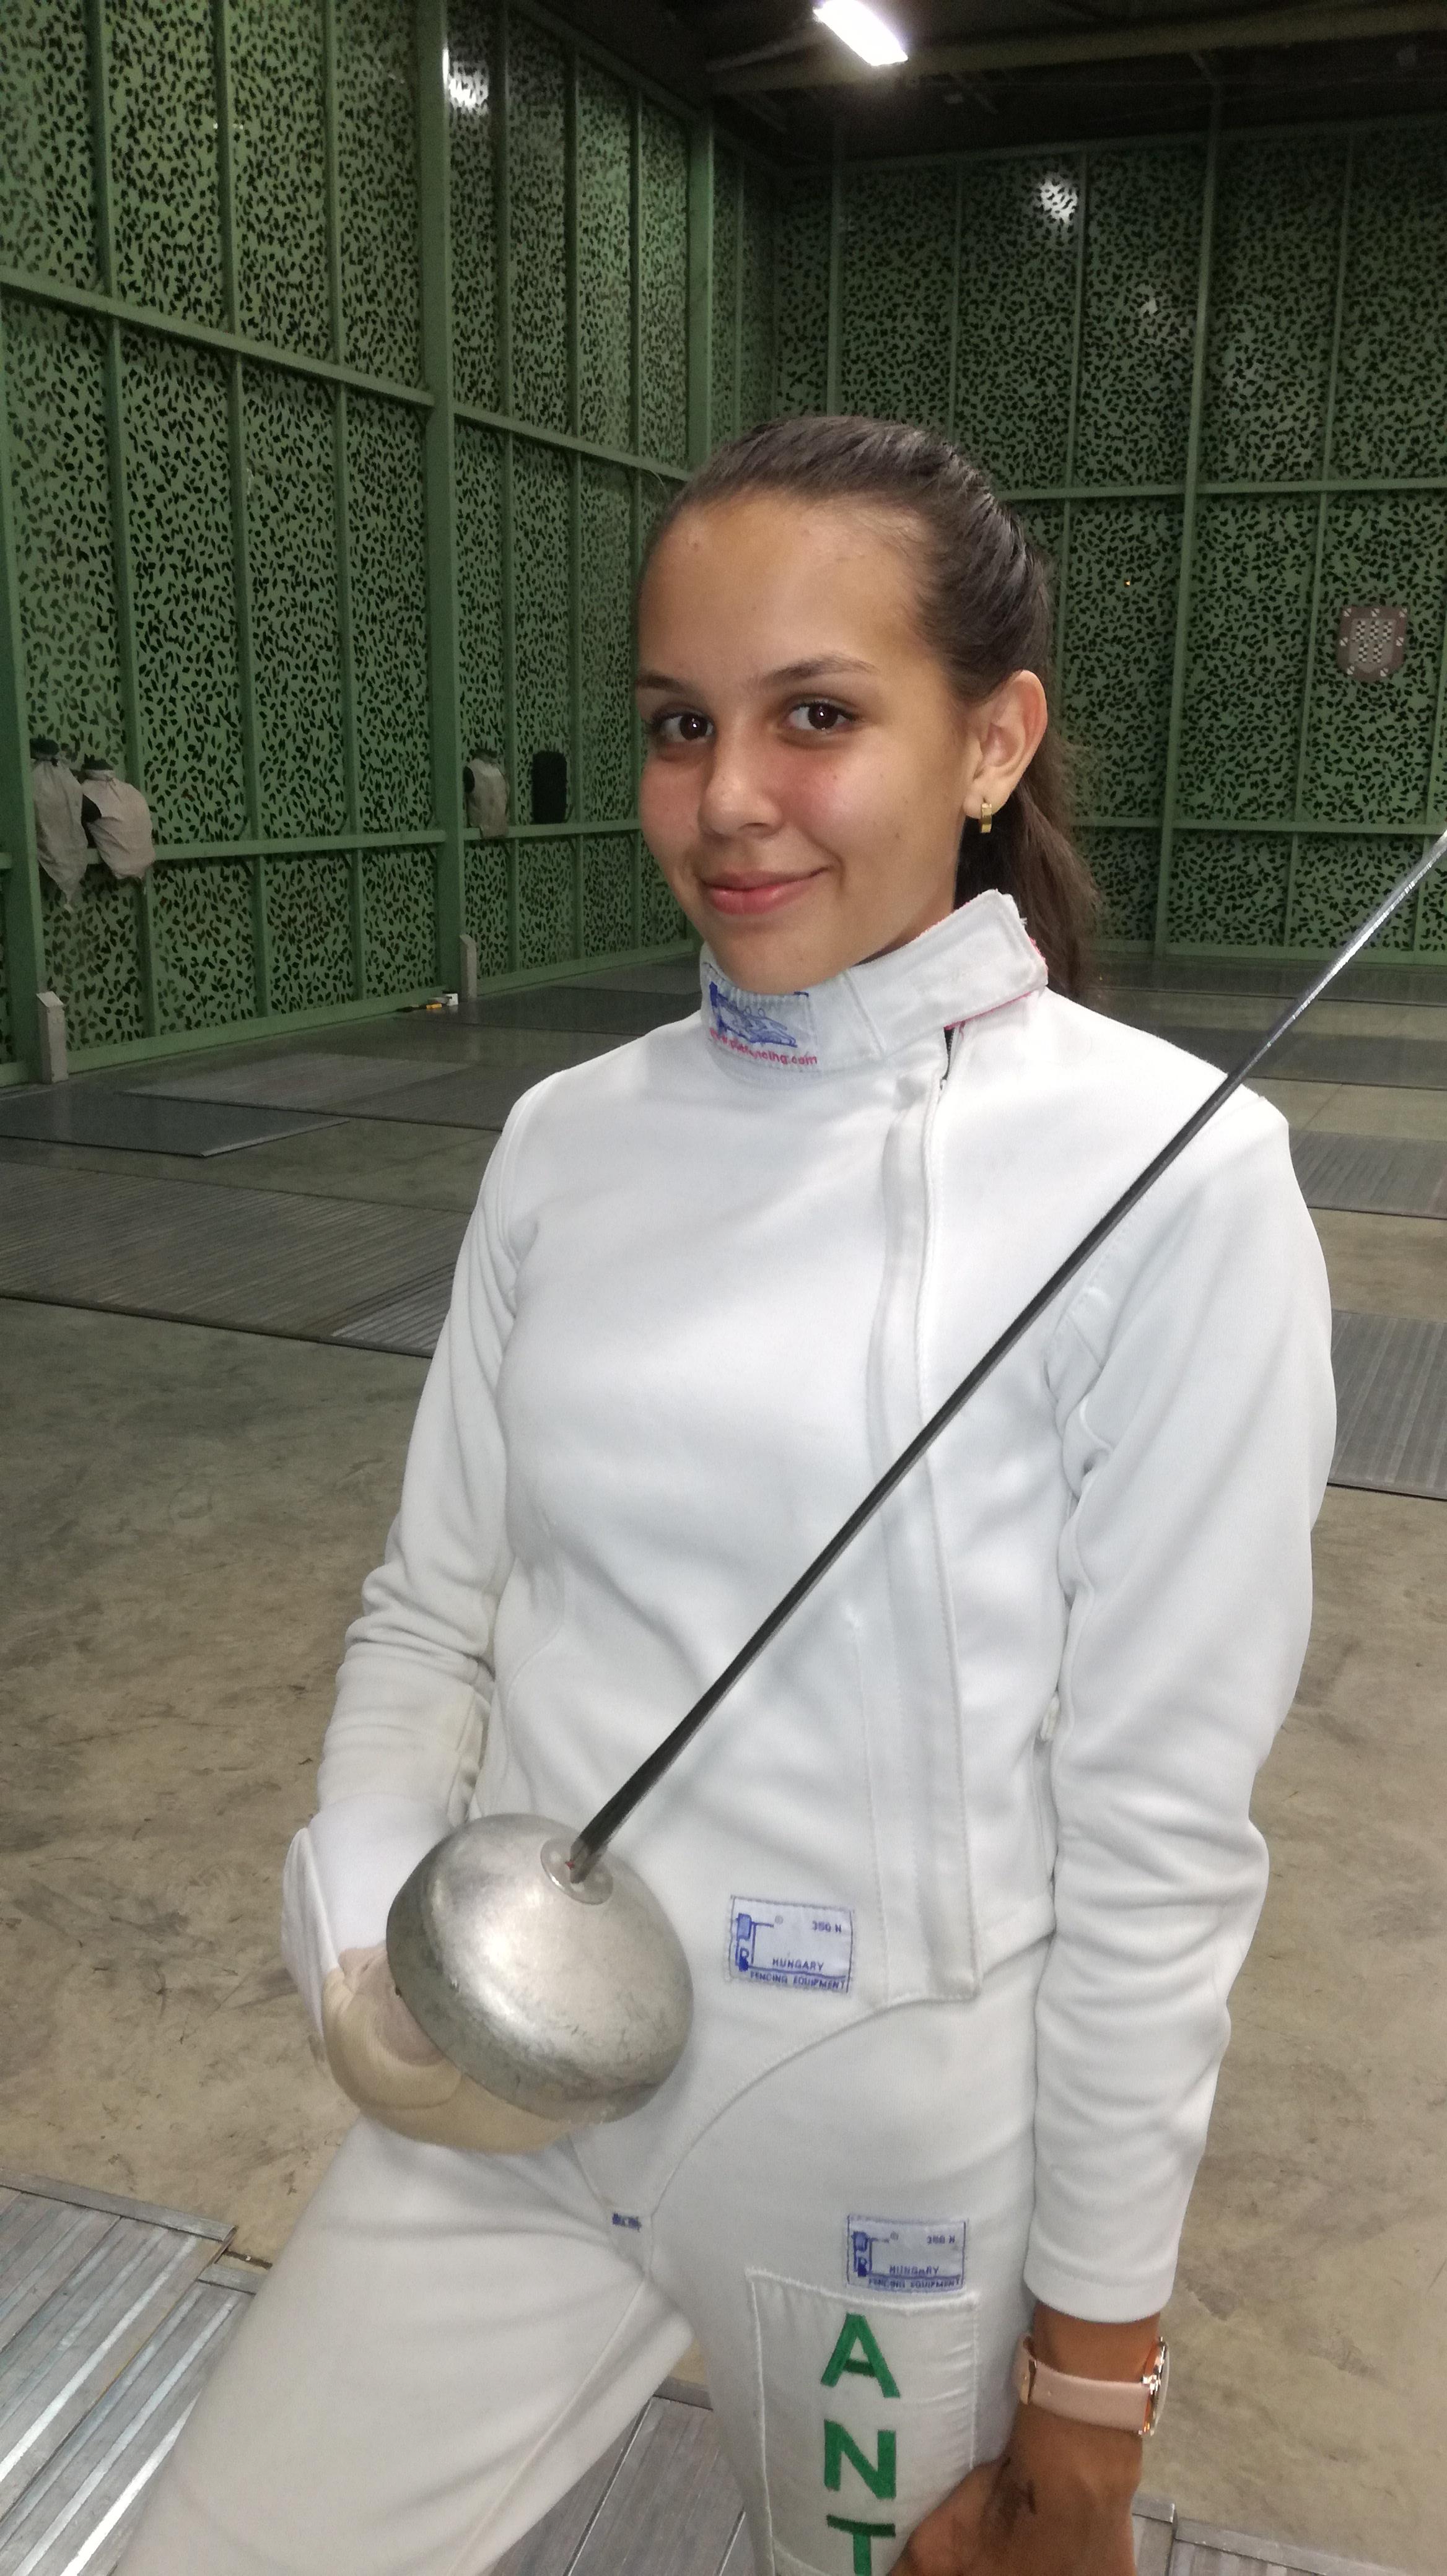 http://www.acordantioquia.com/wp-content/uploads/2018/05/Alejandra-Piedrahita-Gómez-esgrimista-1.jpg